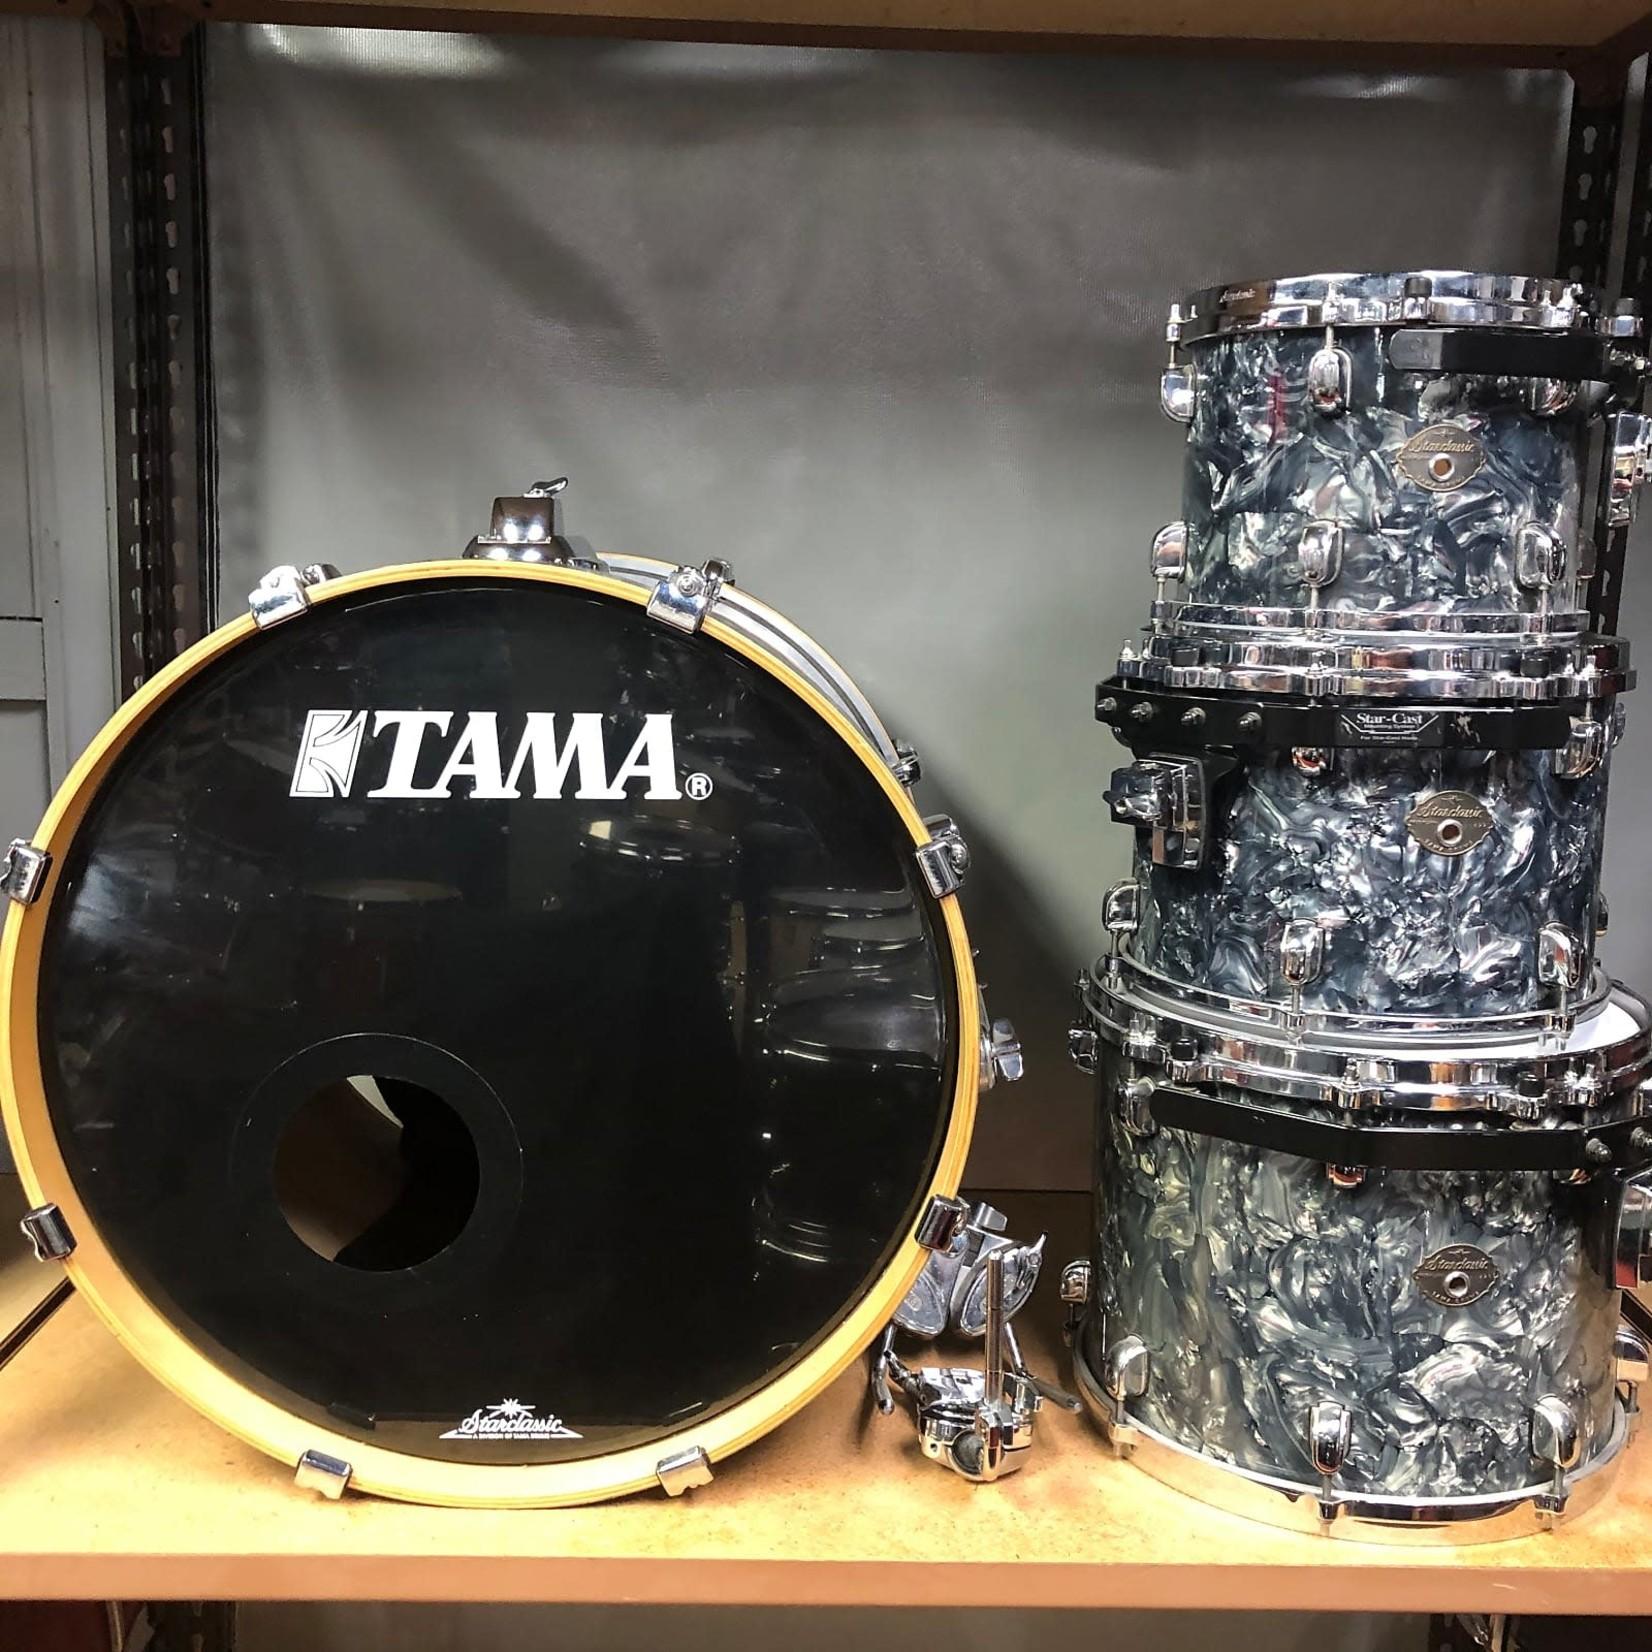 Tama TAMA STARCLASSIC PERFORMER BIRCH 4-PC SHELL PACK 10/12/14/22 (LIQUID METAL)